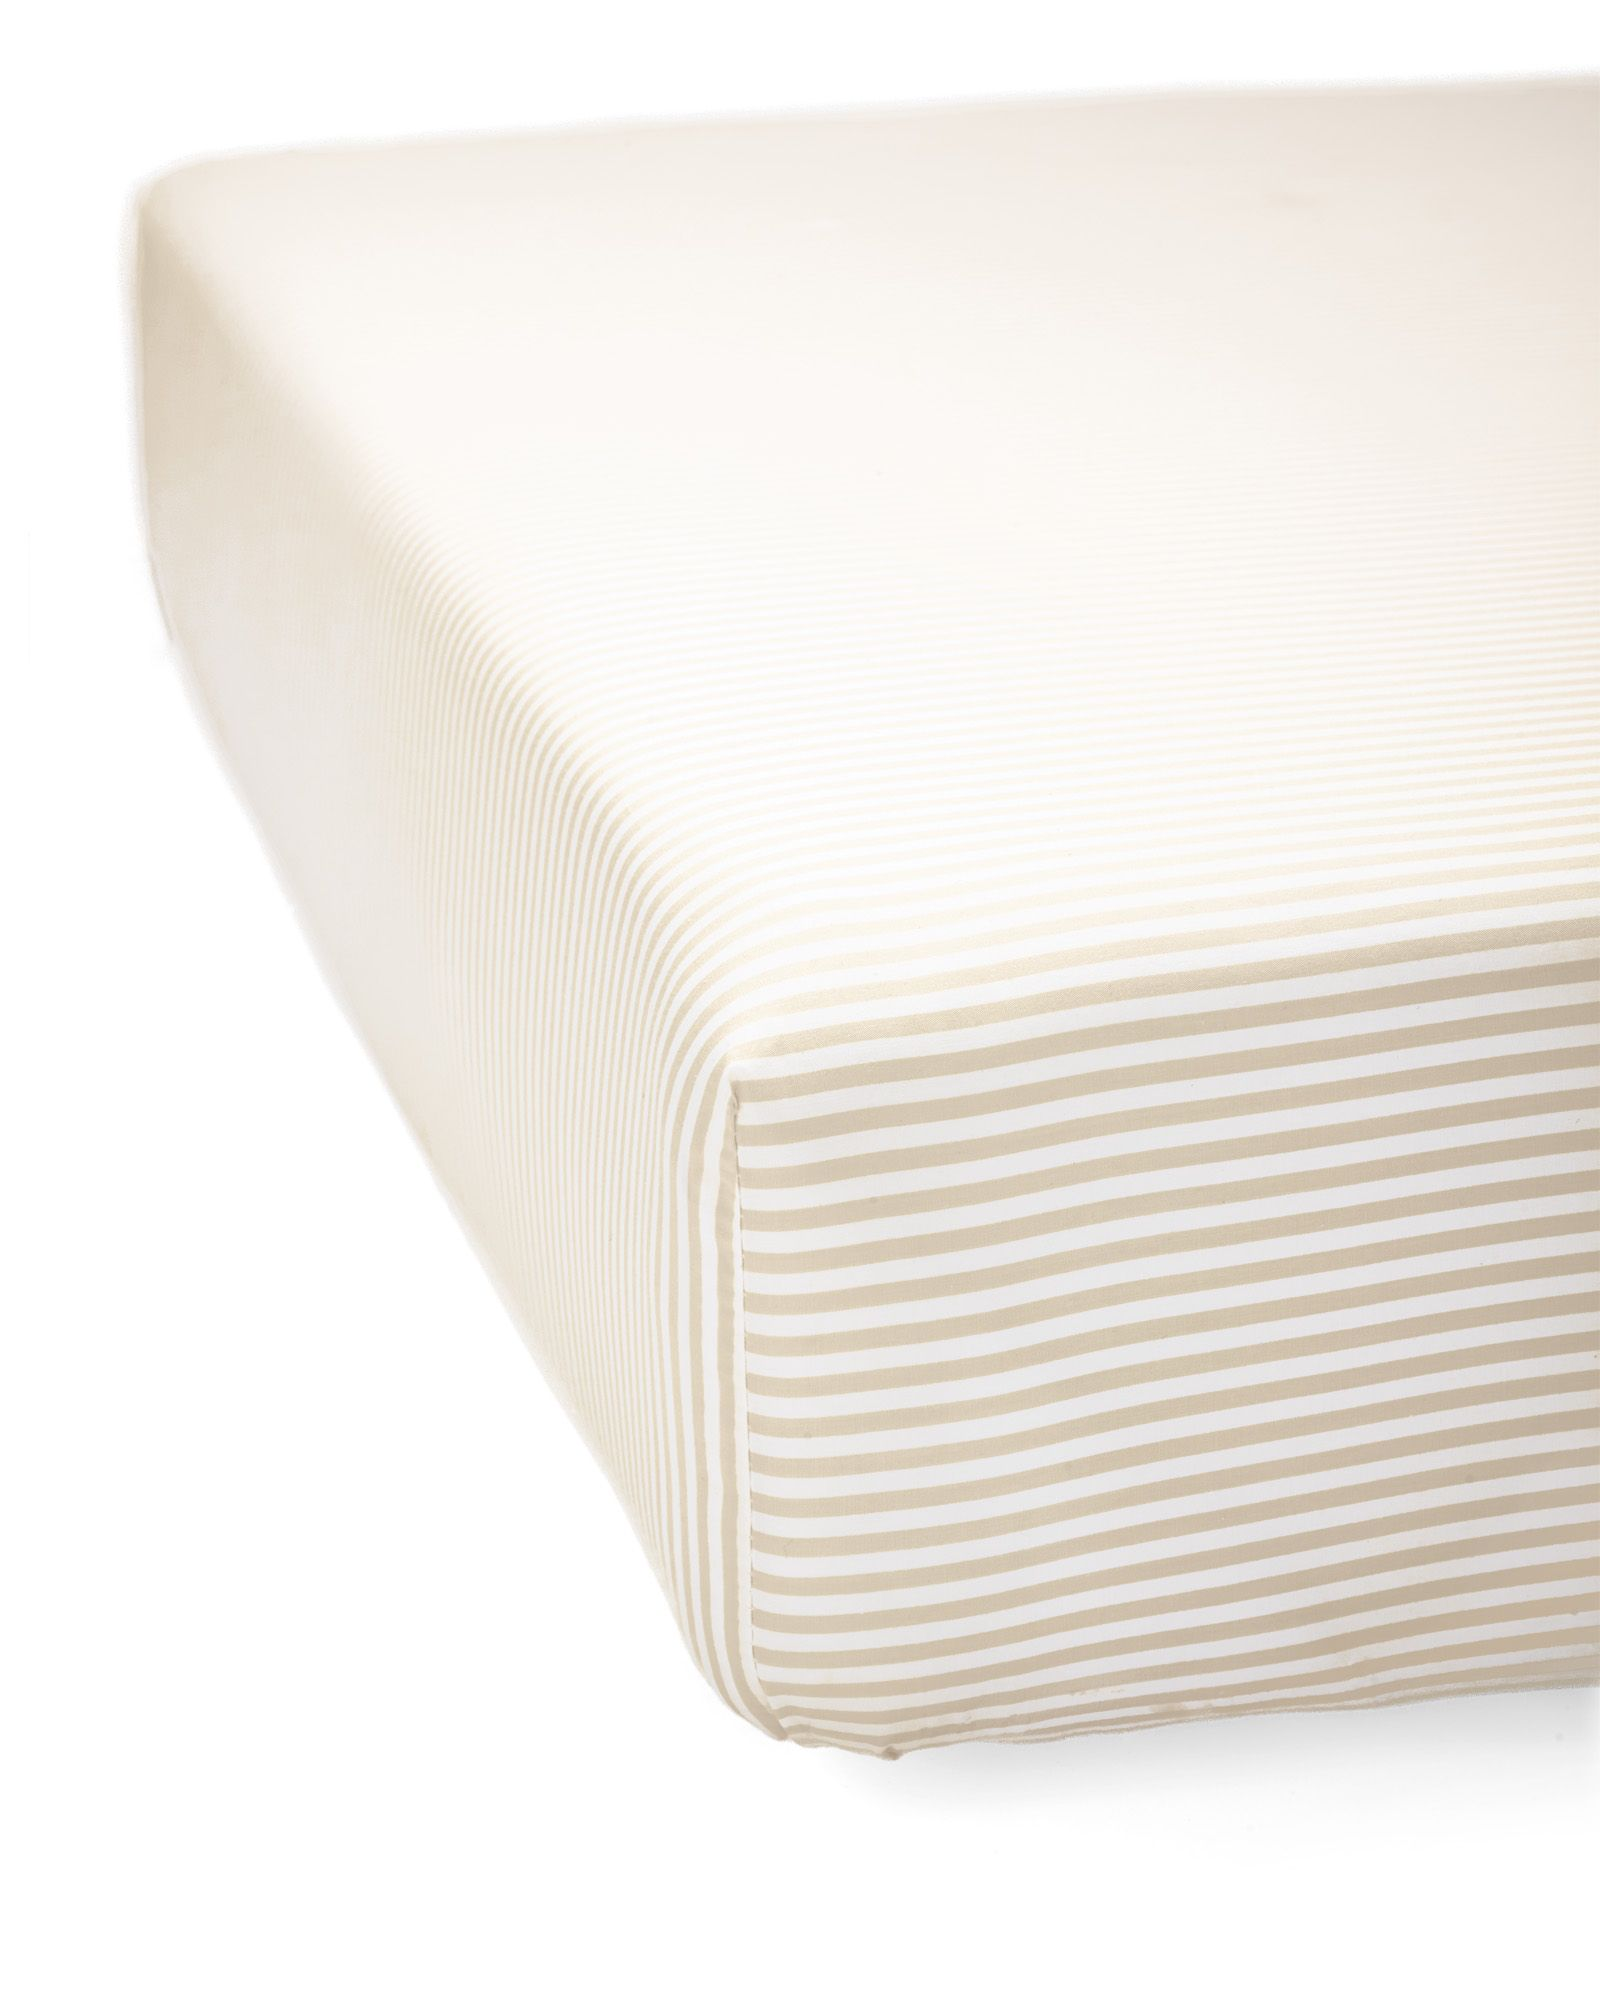 Serena Lily Oxford Stripe Crib Sheet